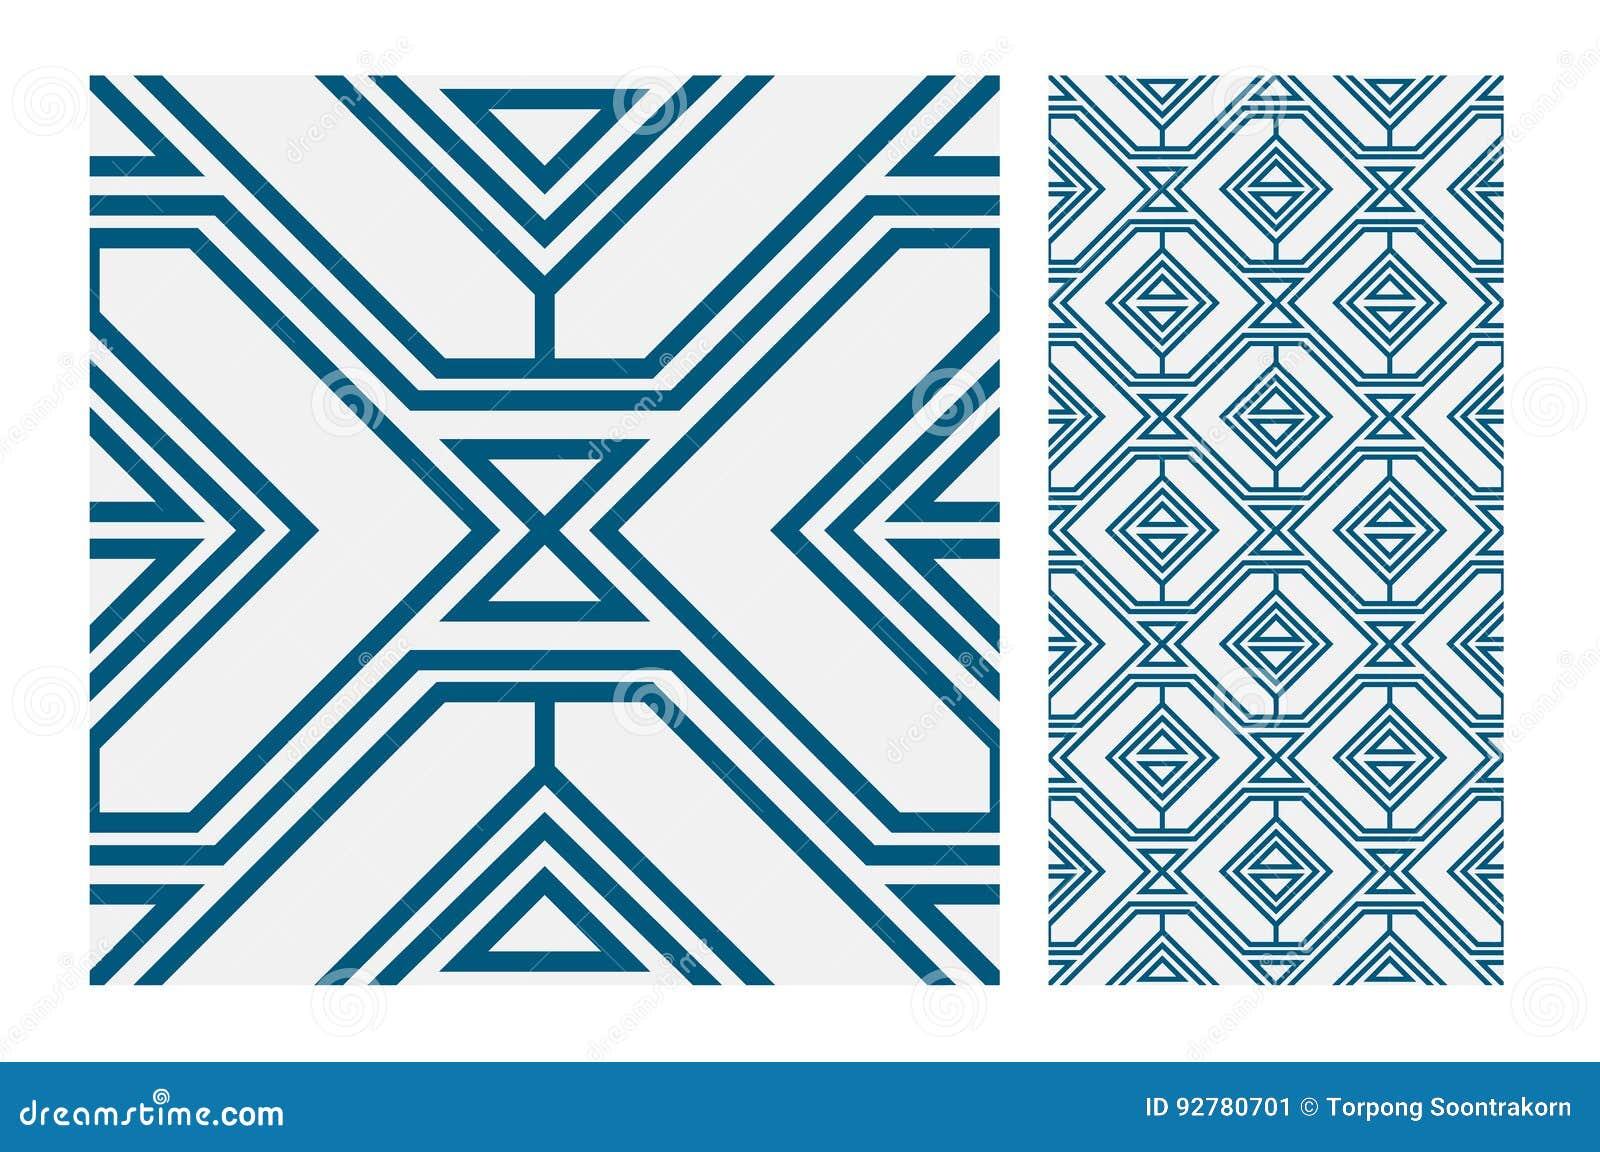 Vintage tile vector stock vector. Illustration of facade - 92780701